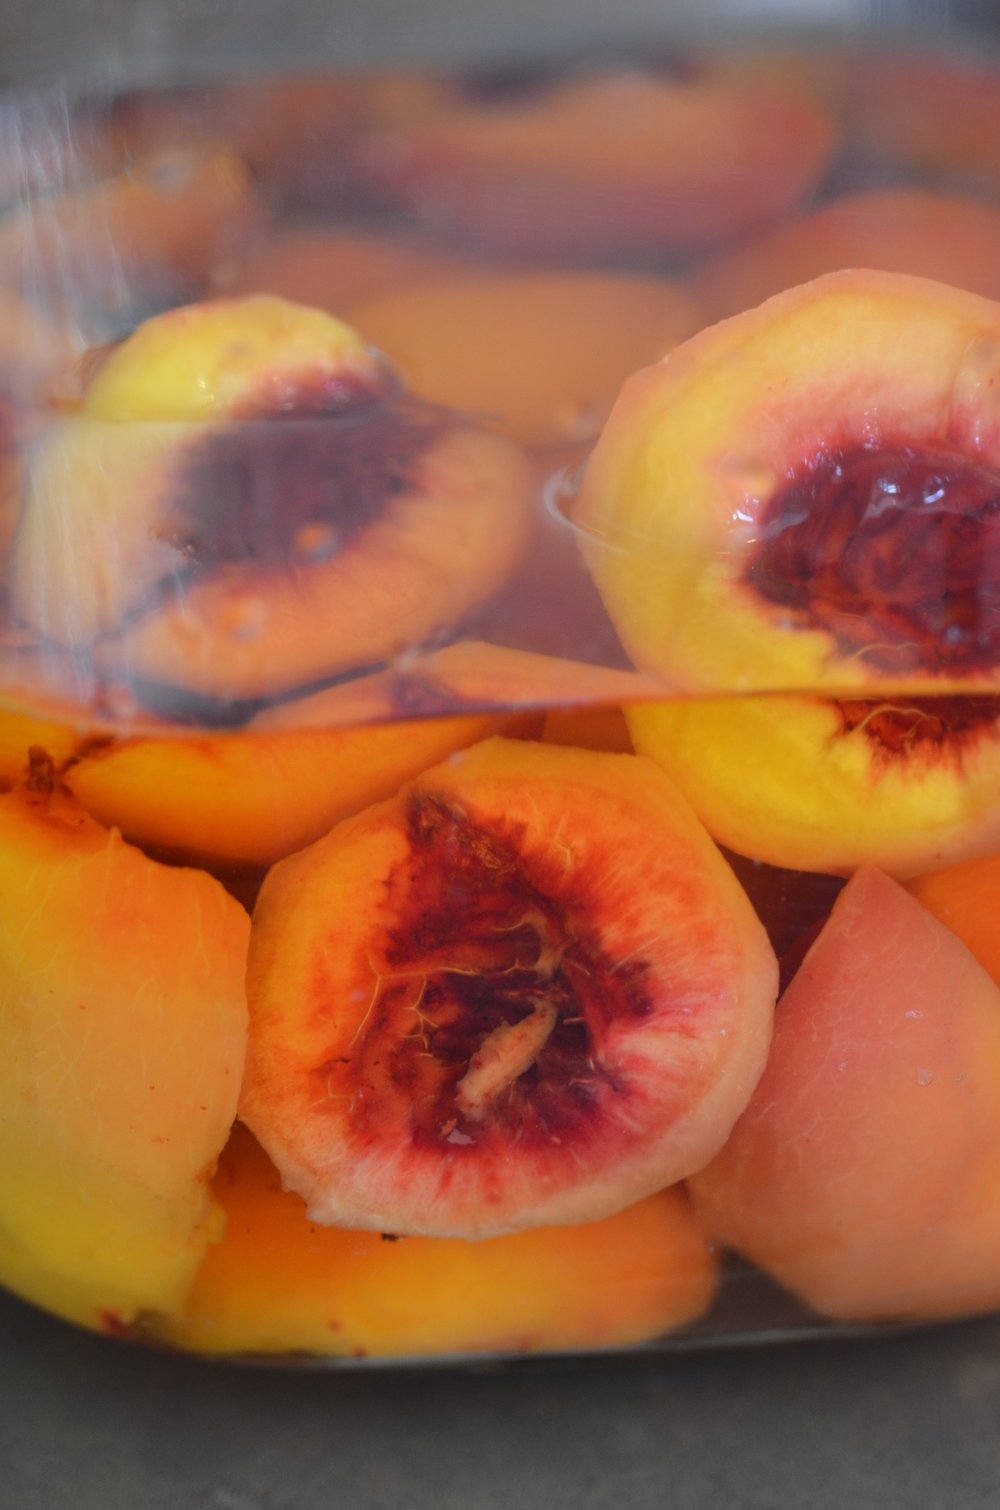 Peaches as I add Jameson